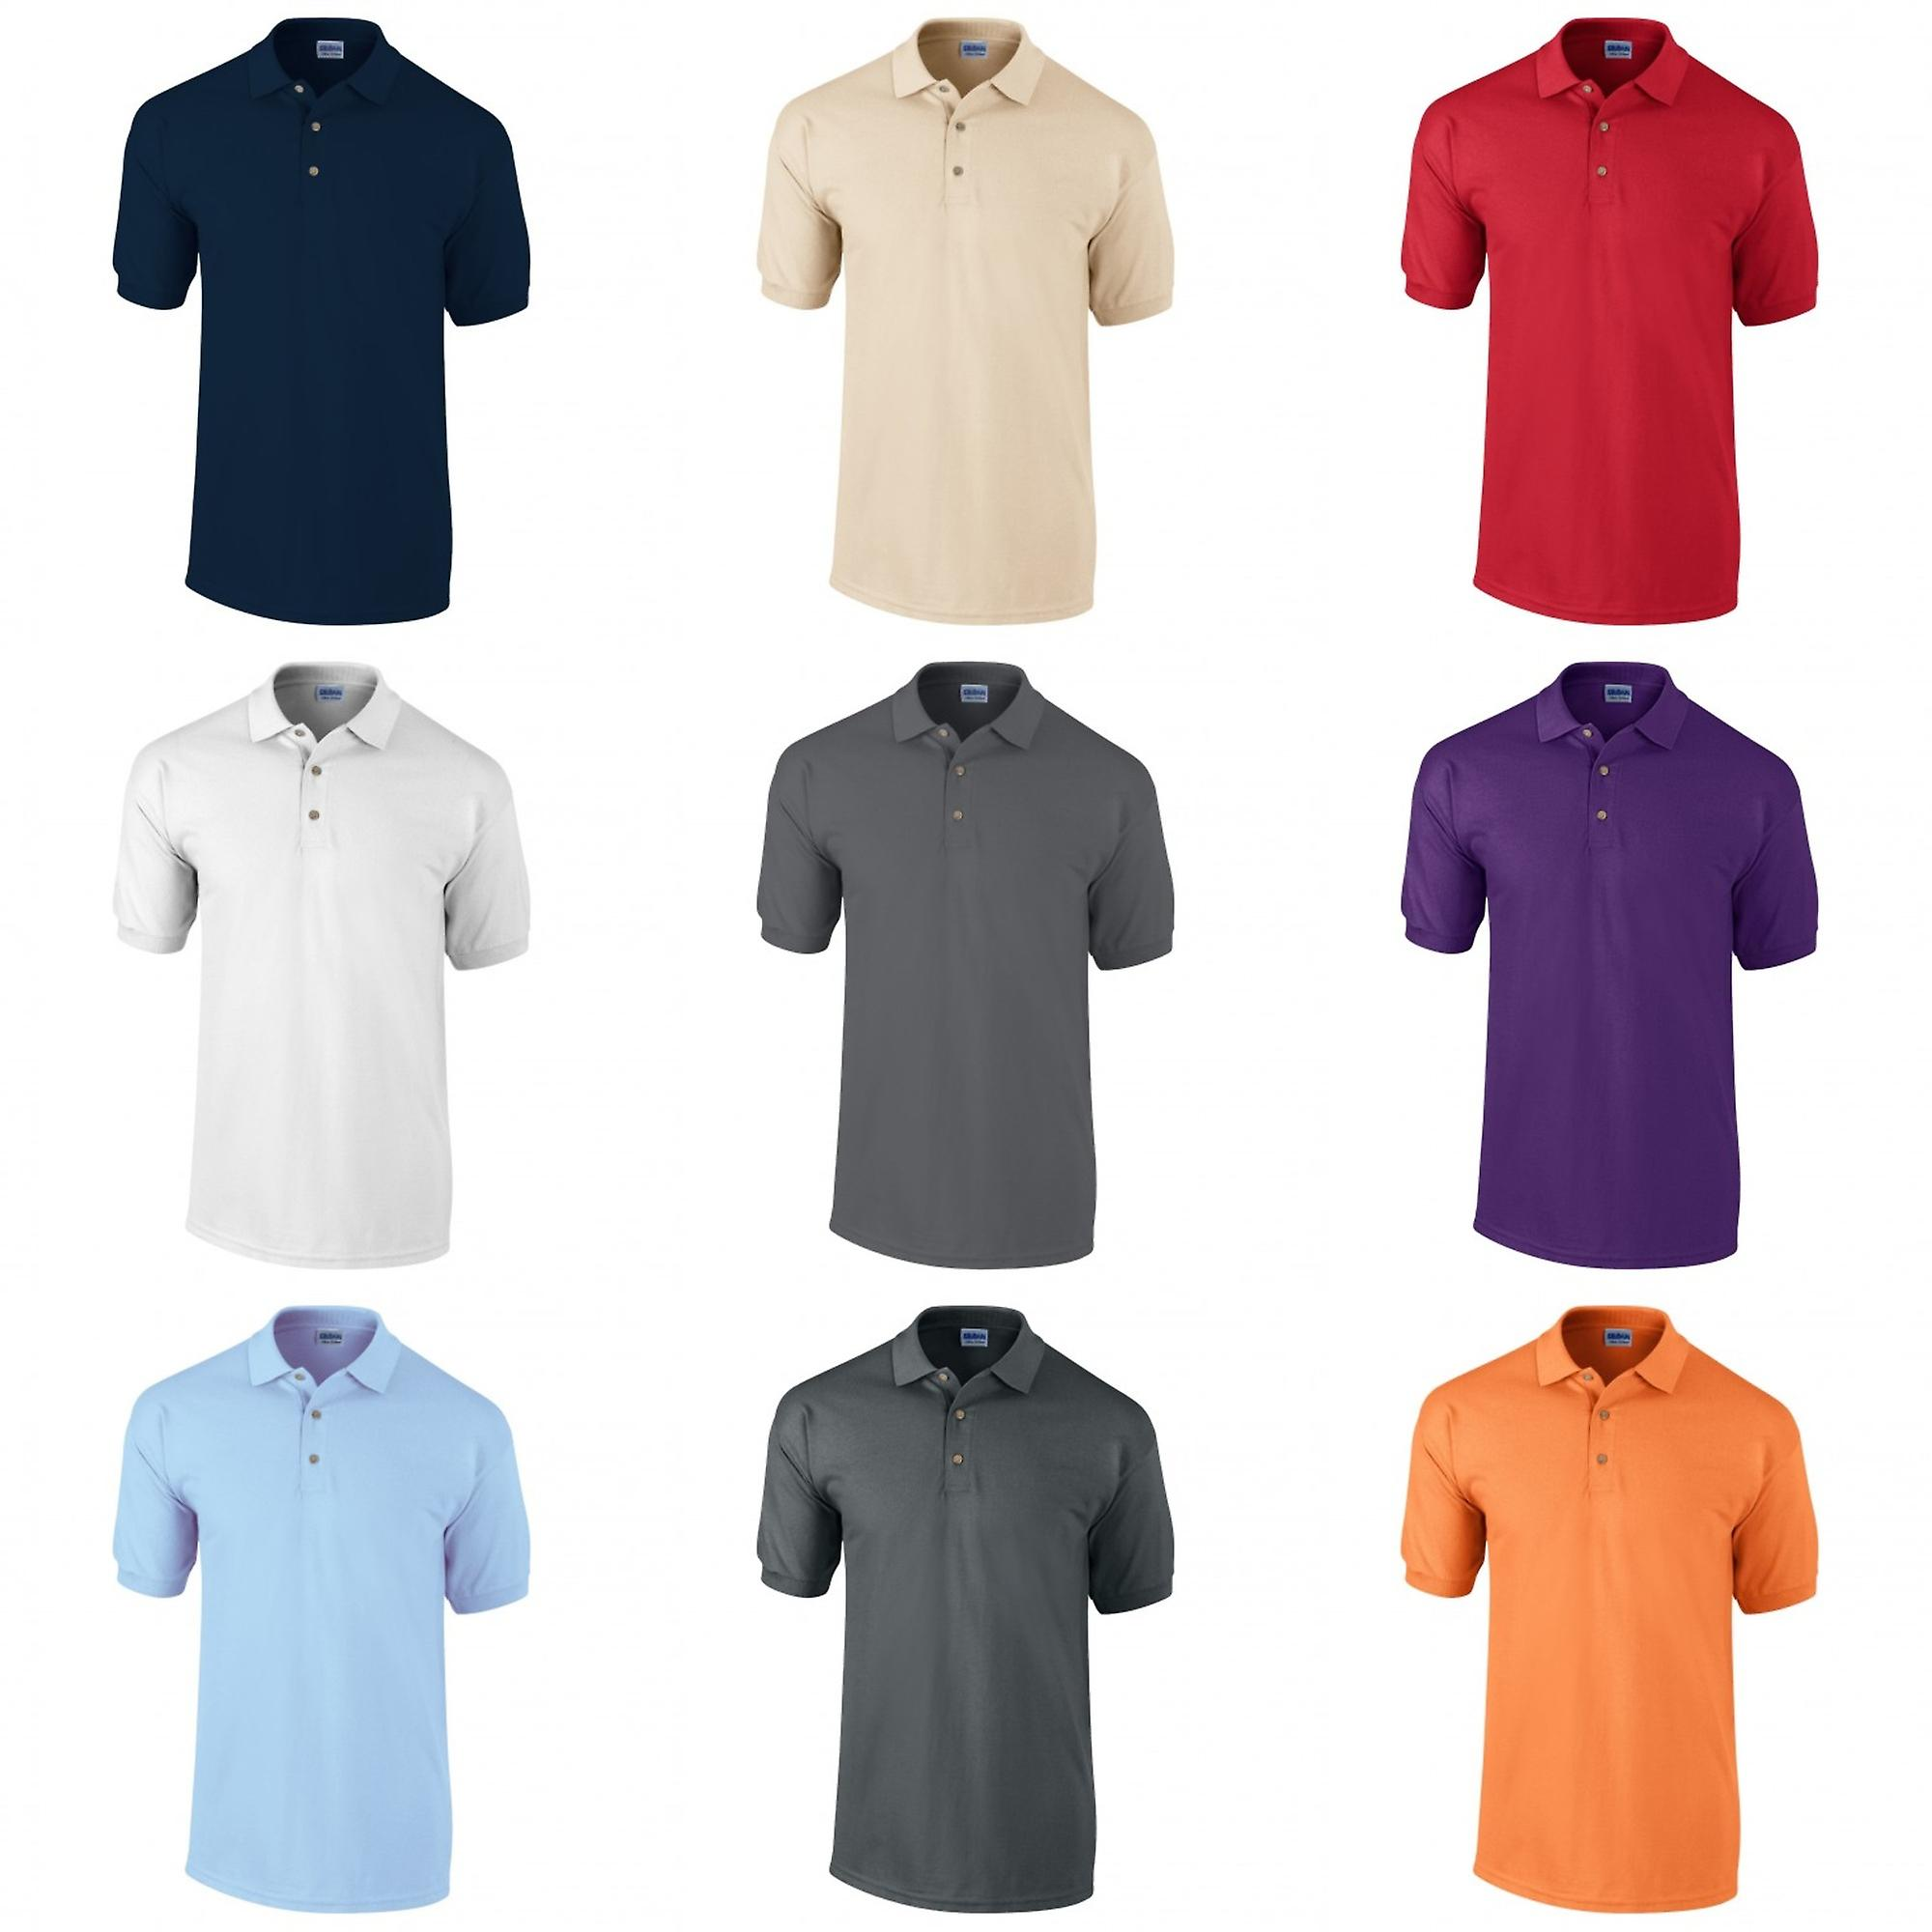 USA Fashion Mens Classic Fit Ultra Cotton Plain Pique Polo ShirtBlackWhite